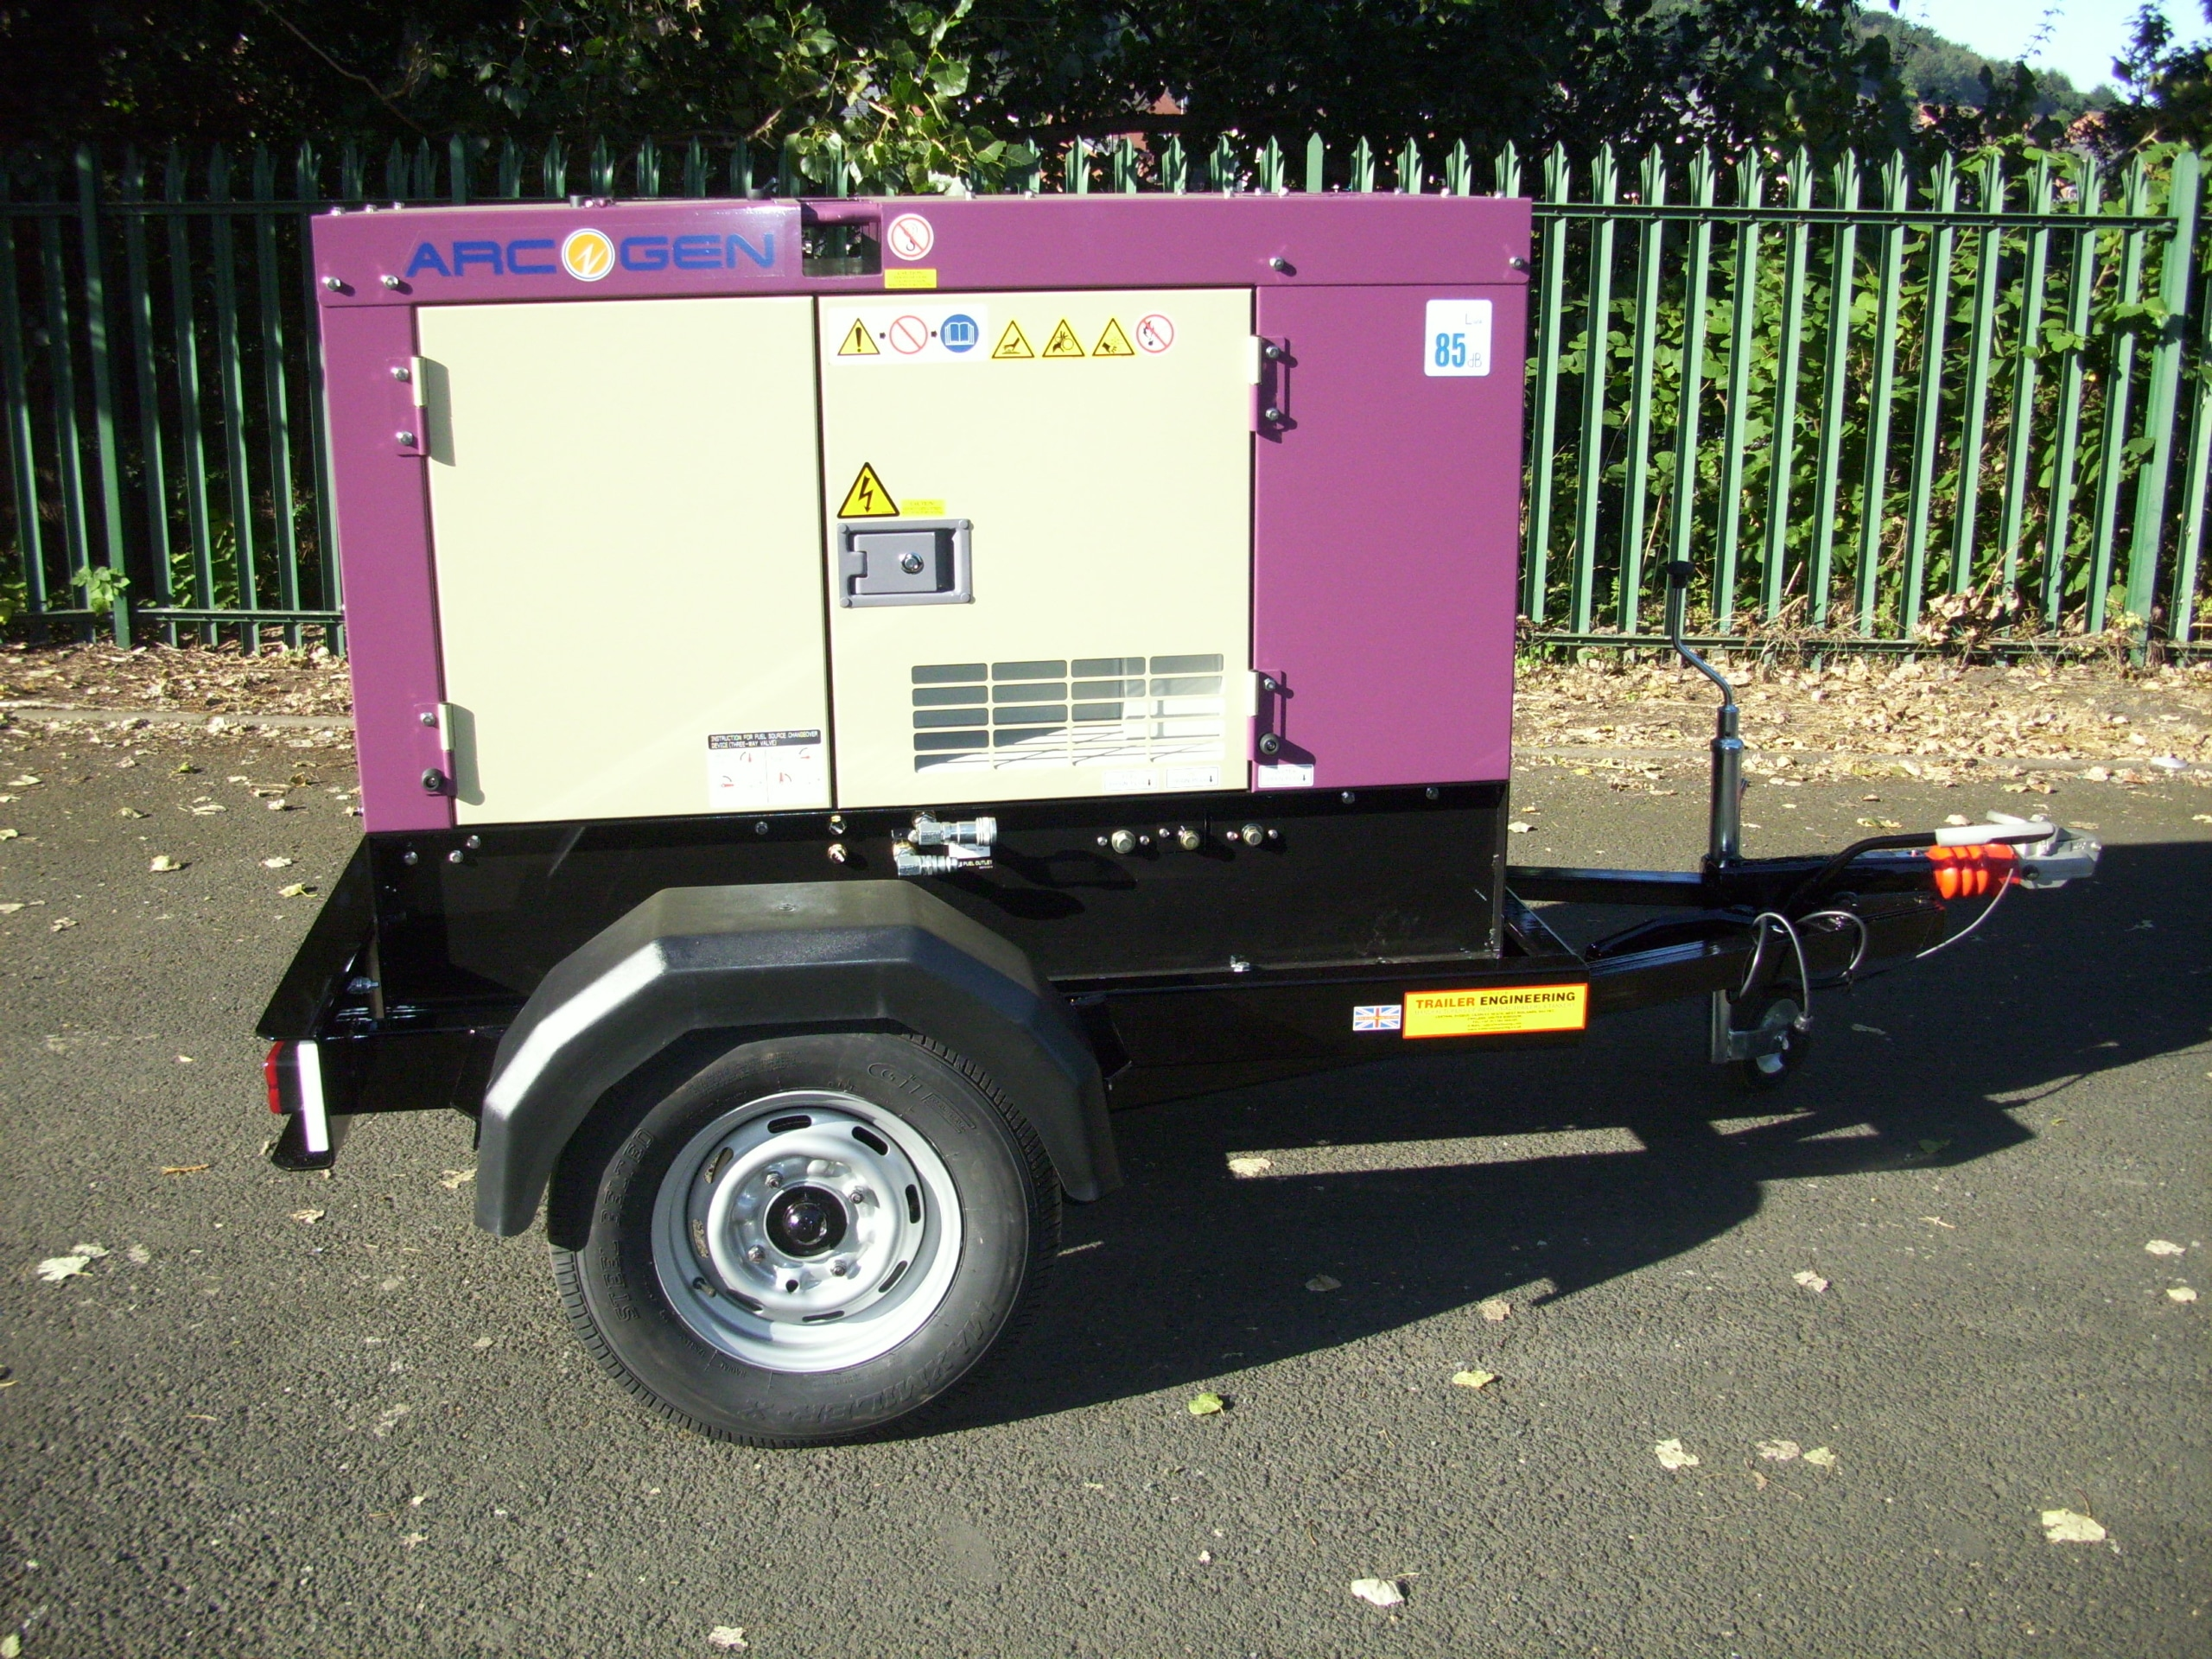 Denyo Arcogen generator trailer